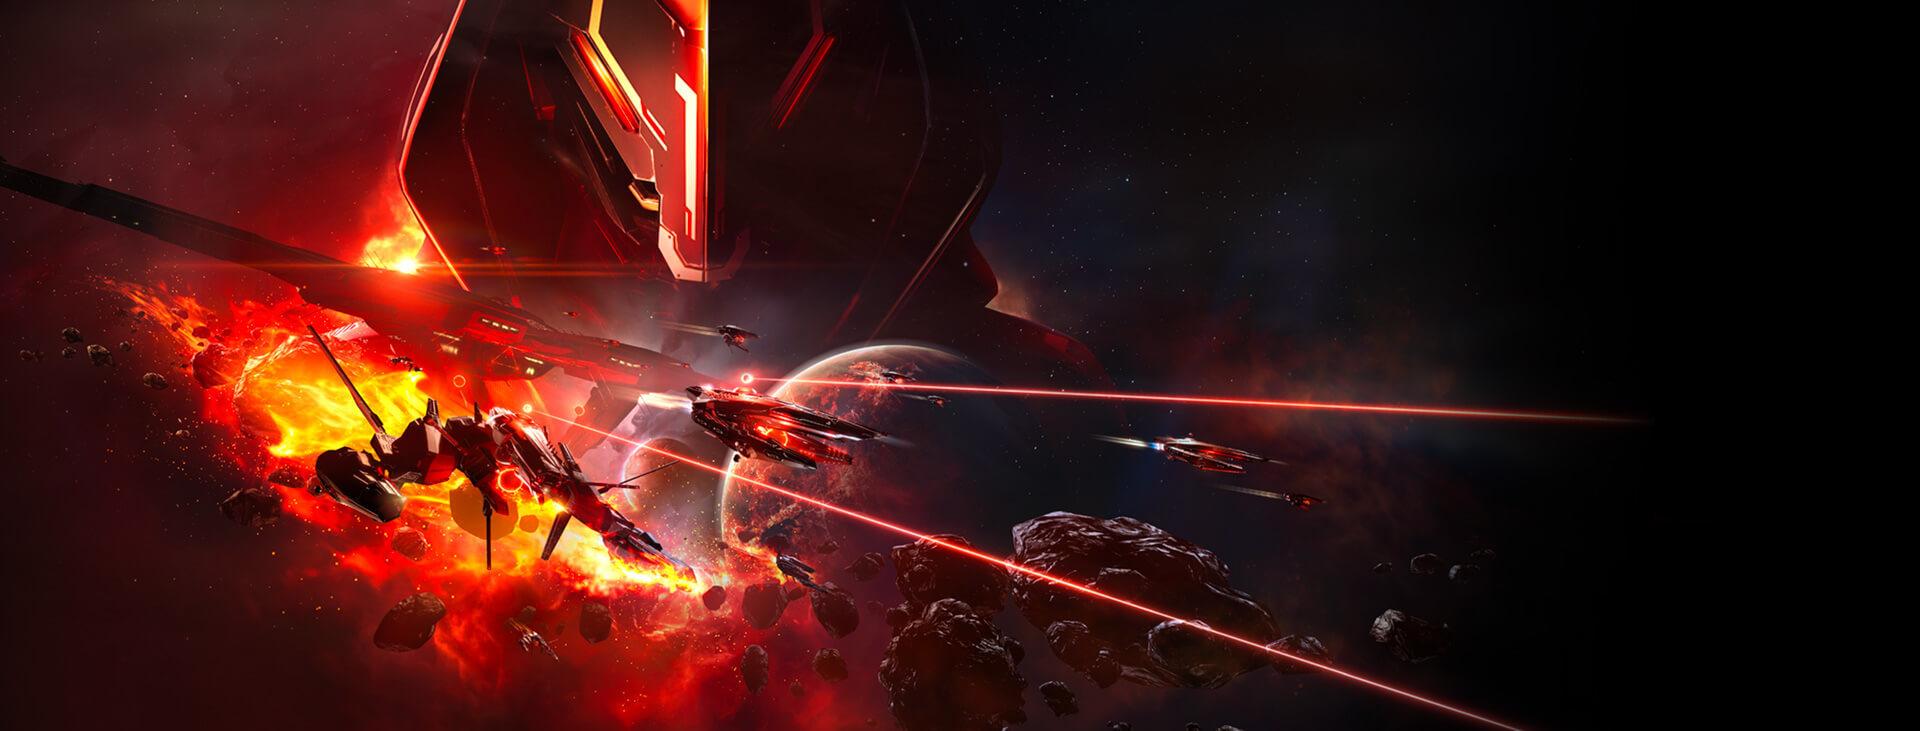 September Release & Events - EVE Updates